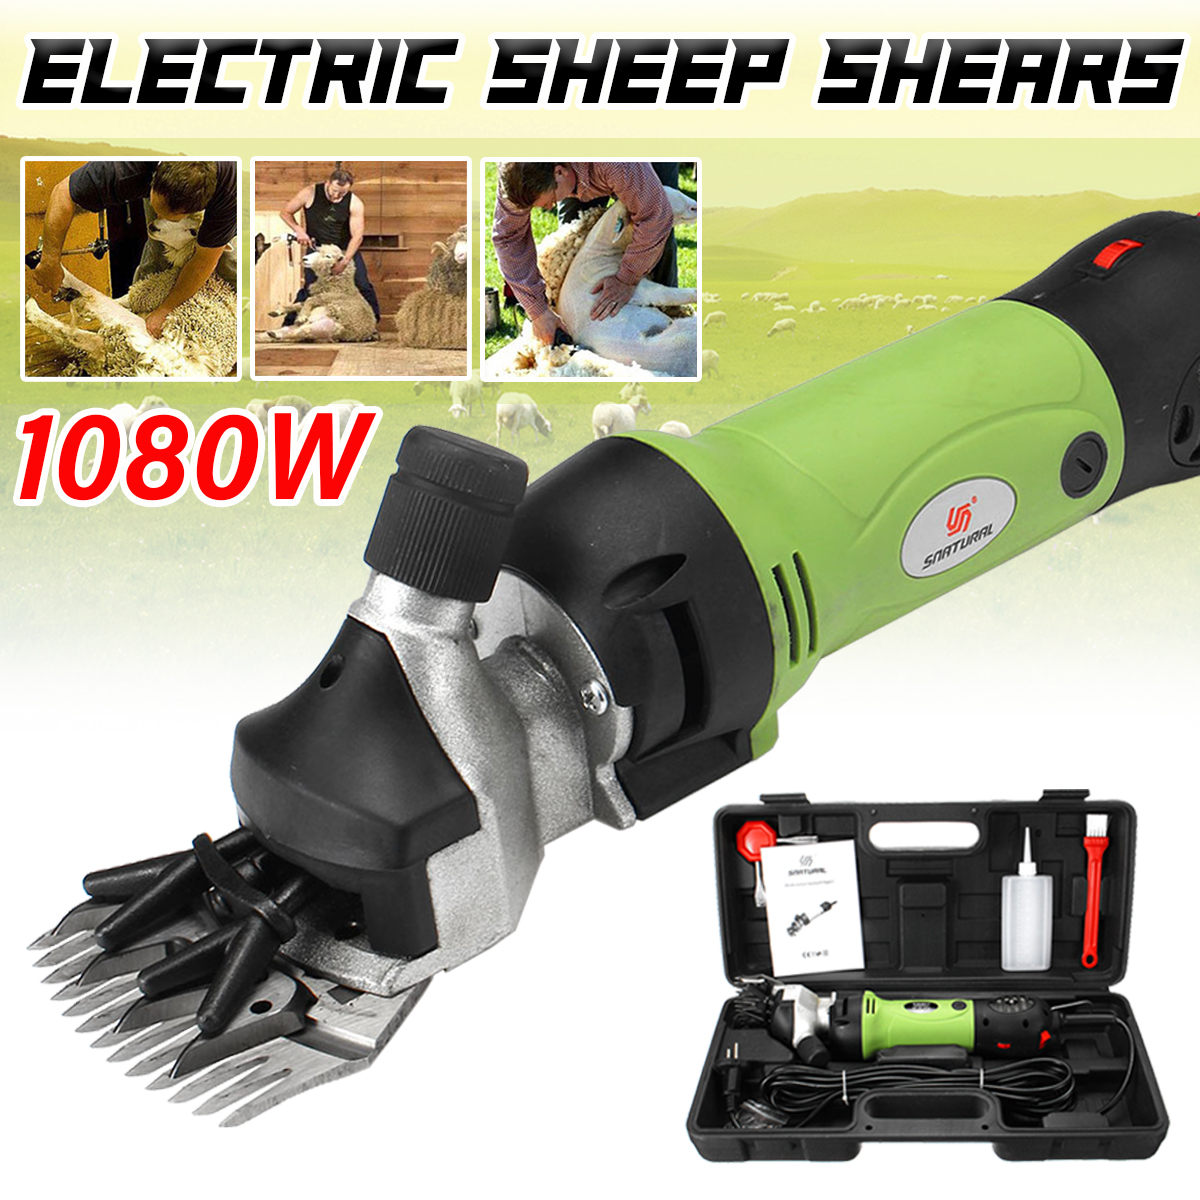 EU Plug Electric Shearing Clipper Shear Sheep Dog Pet Hair Clipper Adjustable 6Speeds Shearing Machine Farm Trimmer Scissor Tool